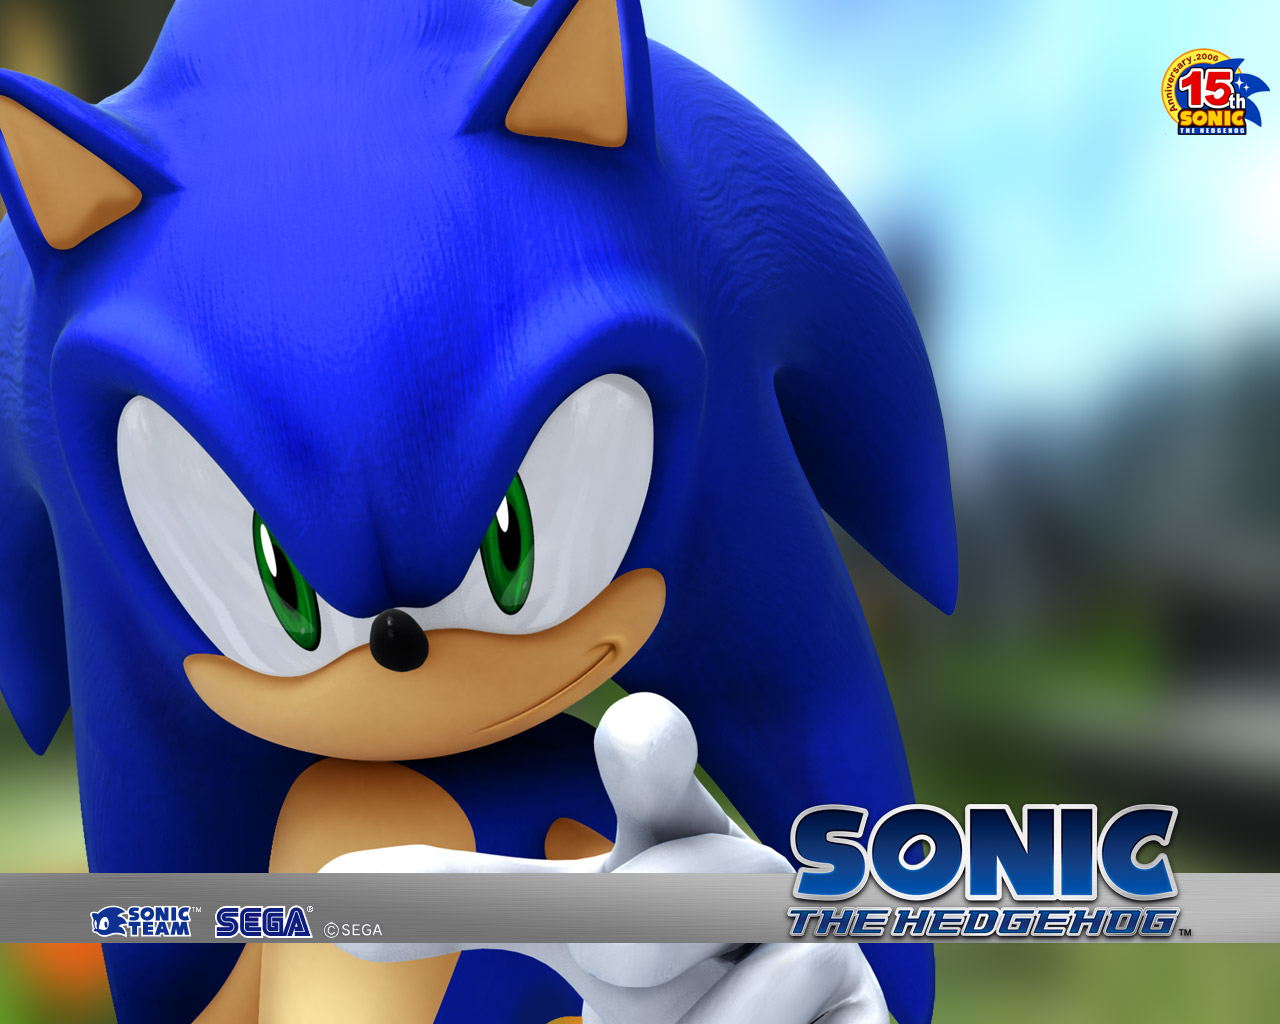 http://4.bp.blogspot.com/-zQkGBK_Egag/Top_Kr6QHQI/AAAAAAAAANw/bfJV6kZOEbo/s1600/sonic-the-hedgehog.jpg